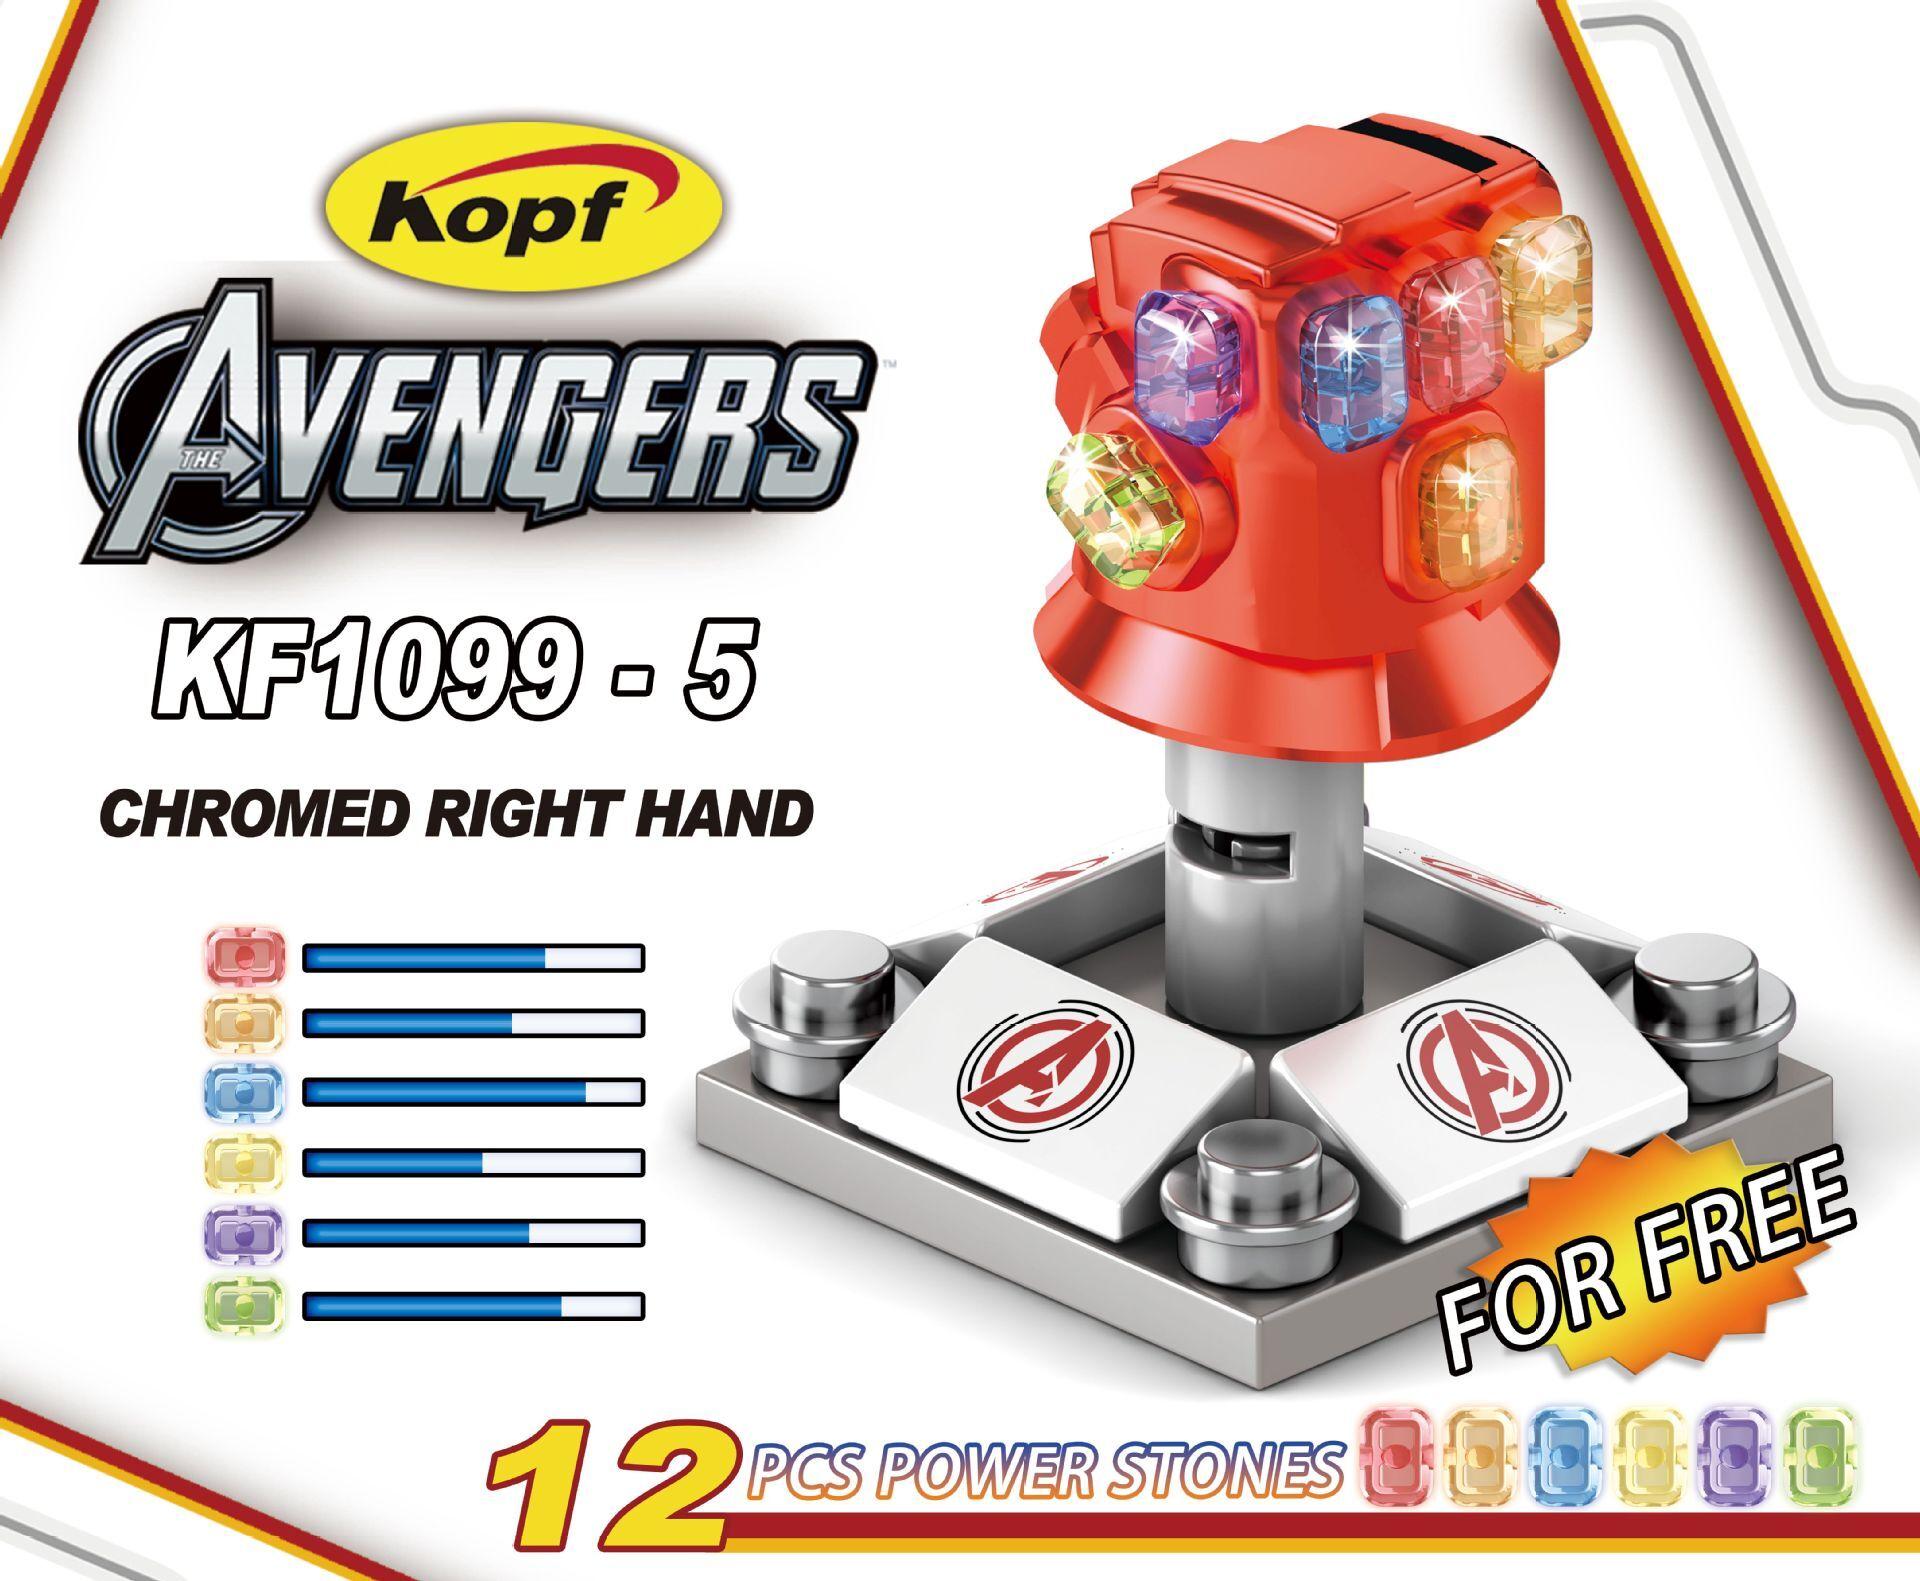 Kopf Superhero Series - Gold plating right hand glove educational toy